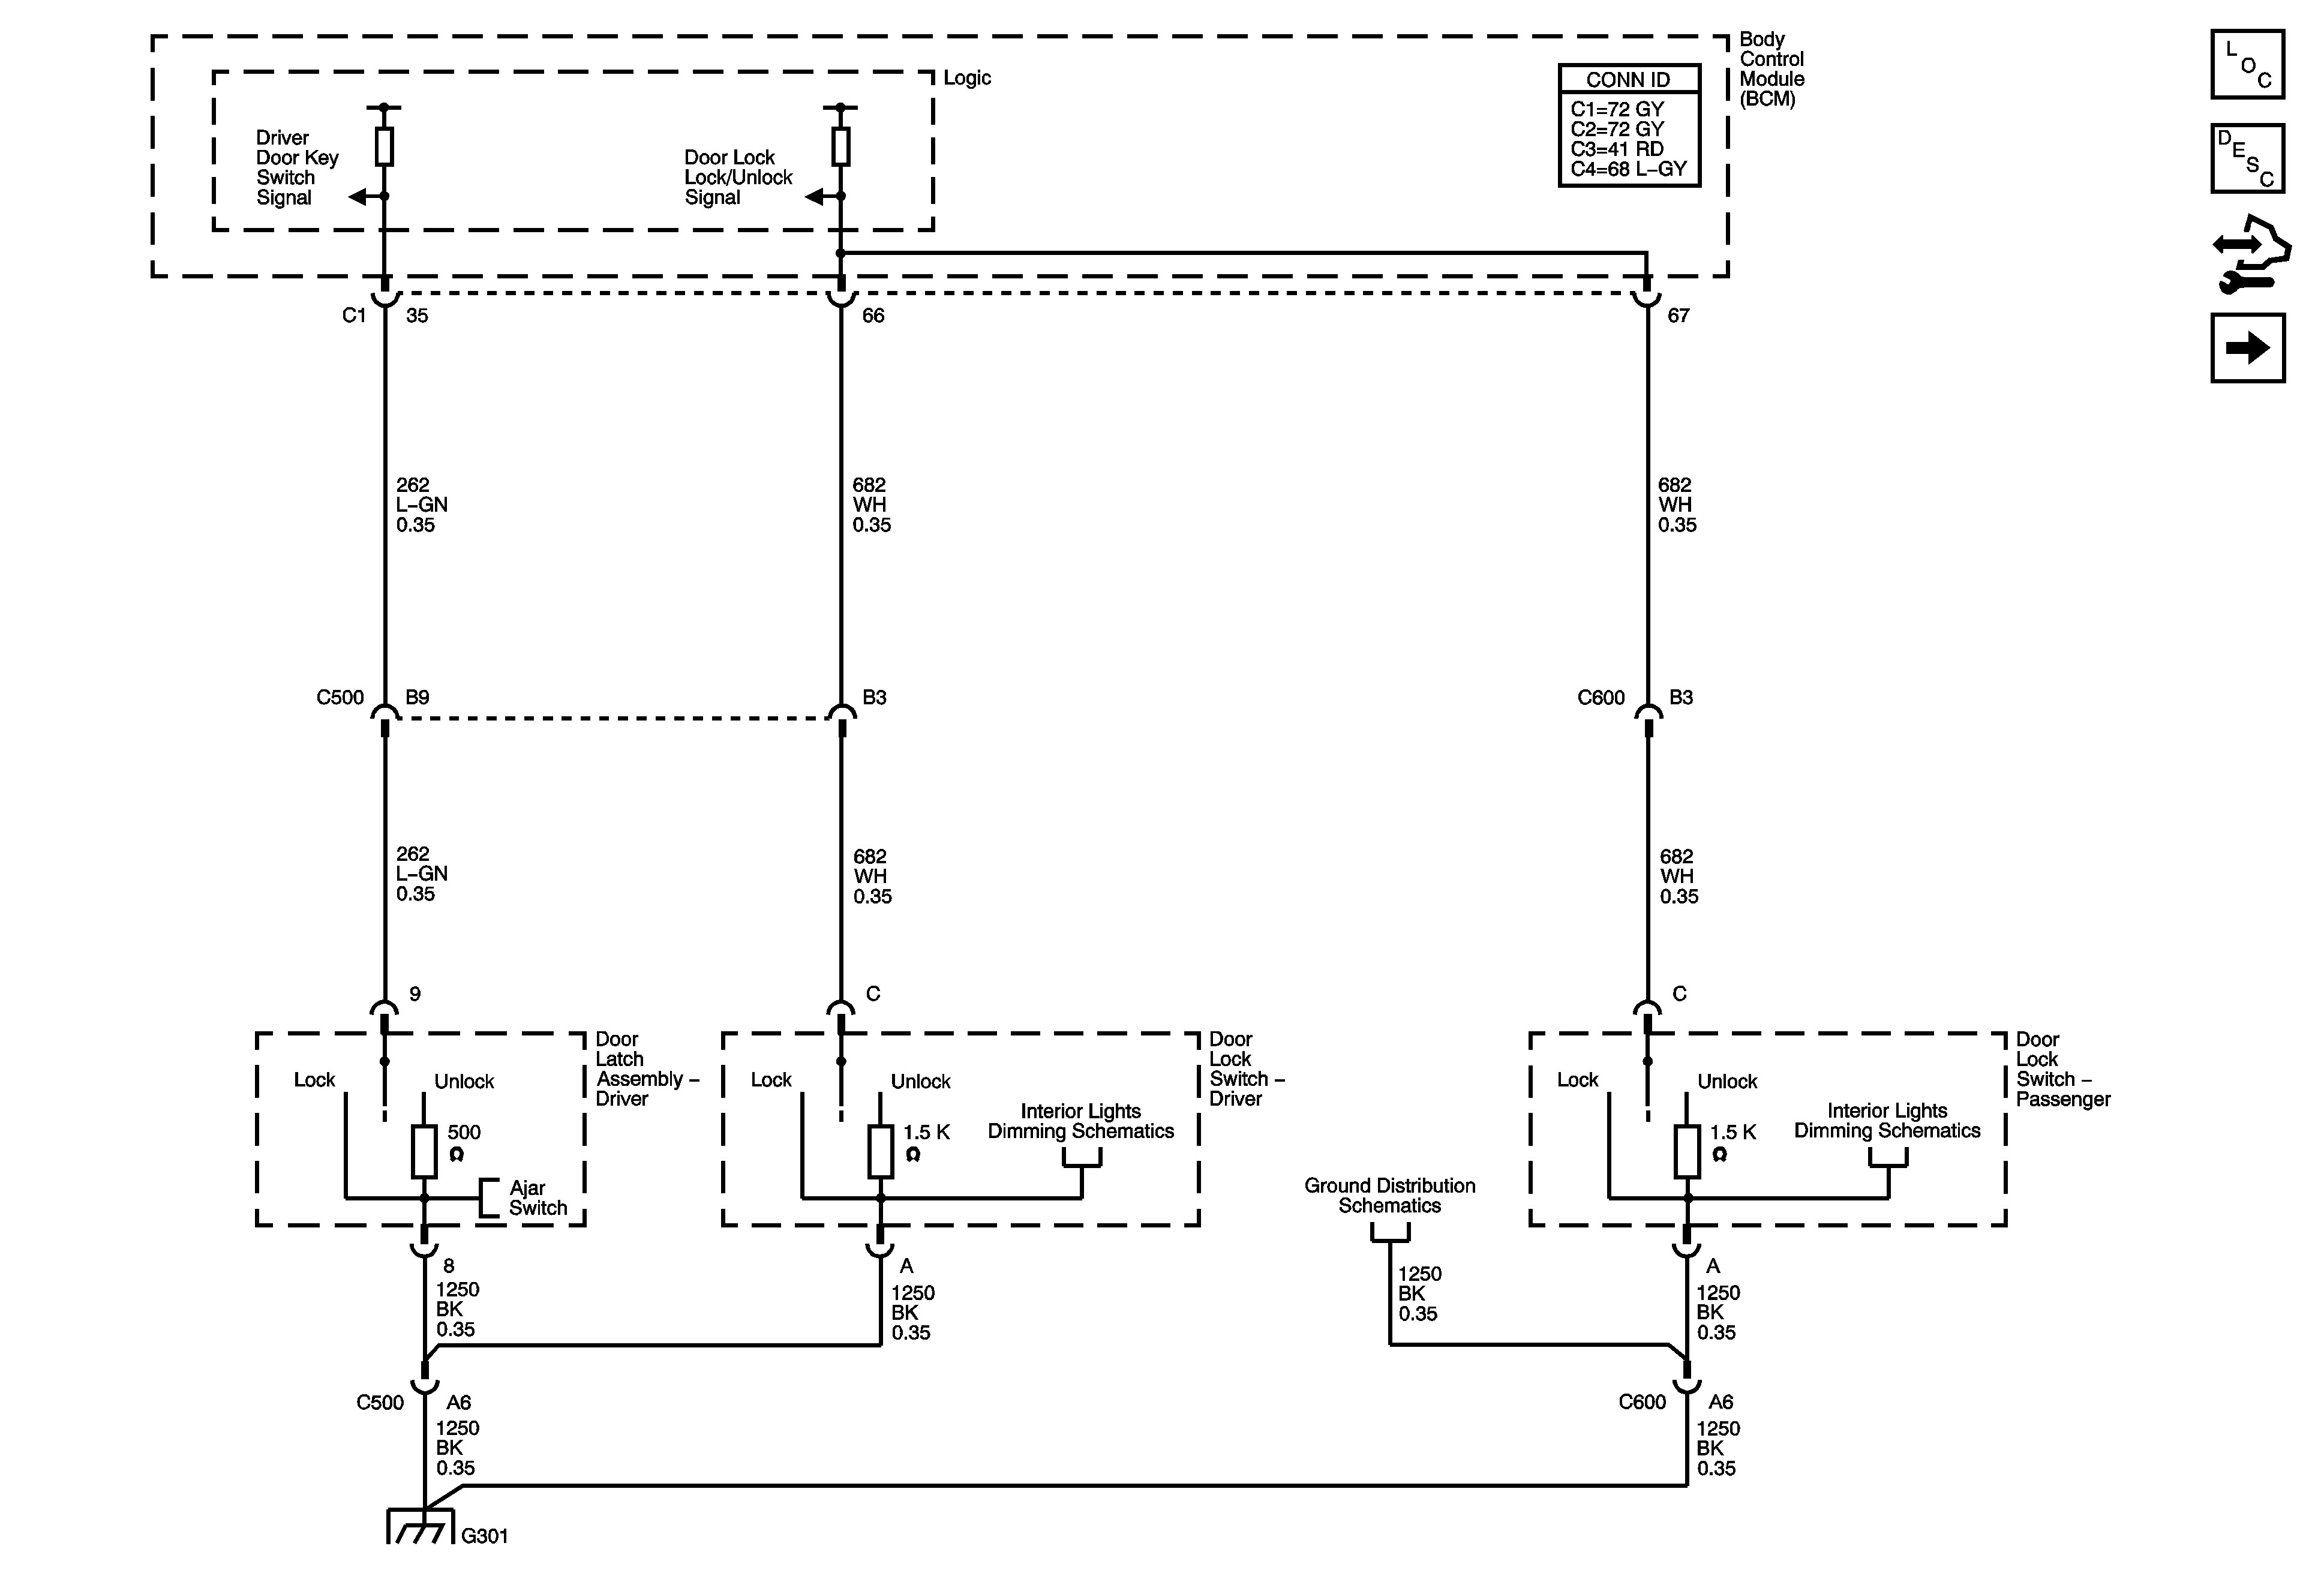 2008 Malibu Starter Circuit Schematic 2008 Chevy Impala Door Lock Wiring Diagram Free Download Of 2008 Malibu Starter Circuit Schematic